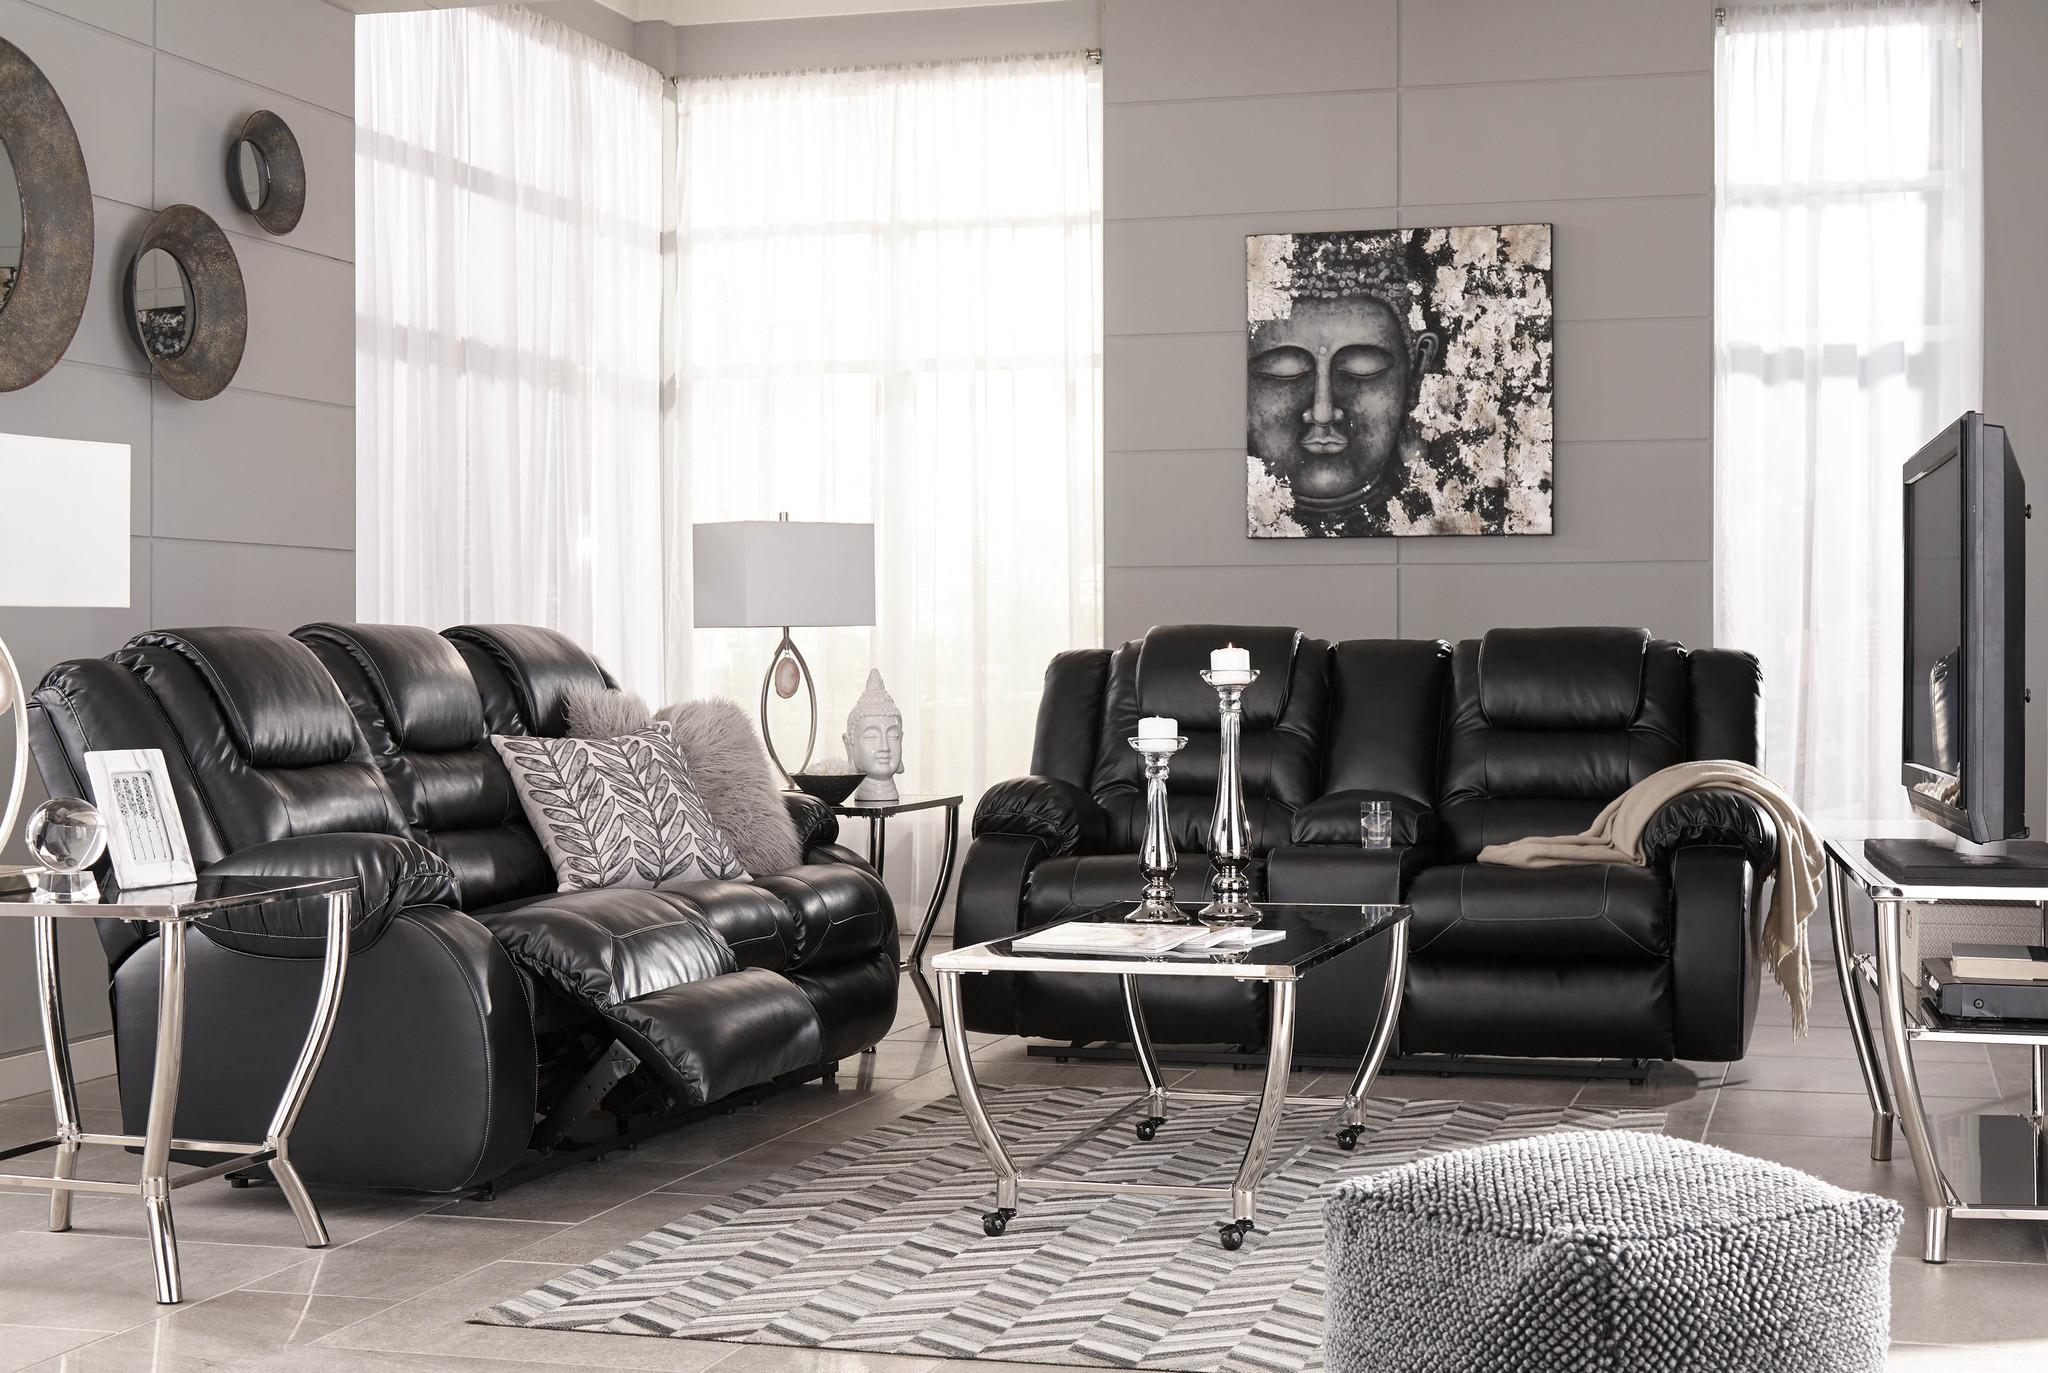 Super 2Pc Vacherie Black Sofa And Loveseat Reclining Set Ibusinesslaw Wood Chair Design Ideas Ibusinesslaworg